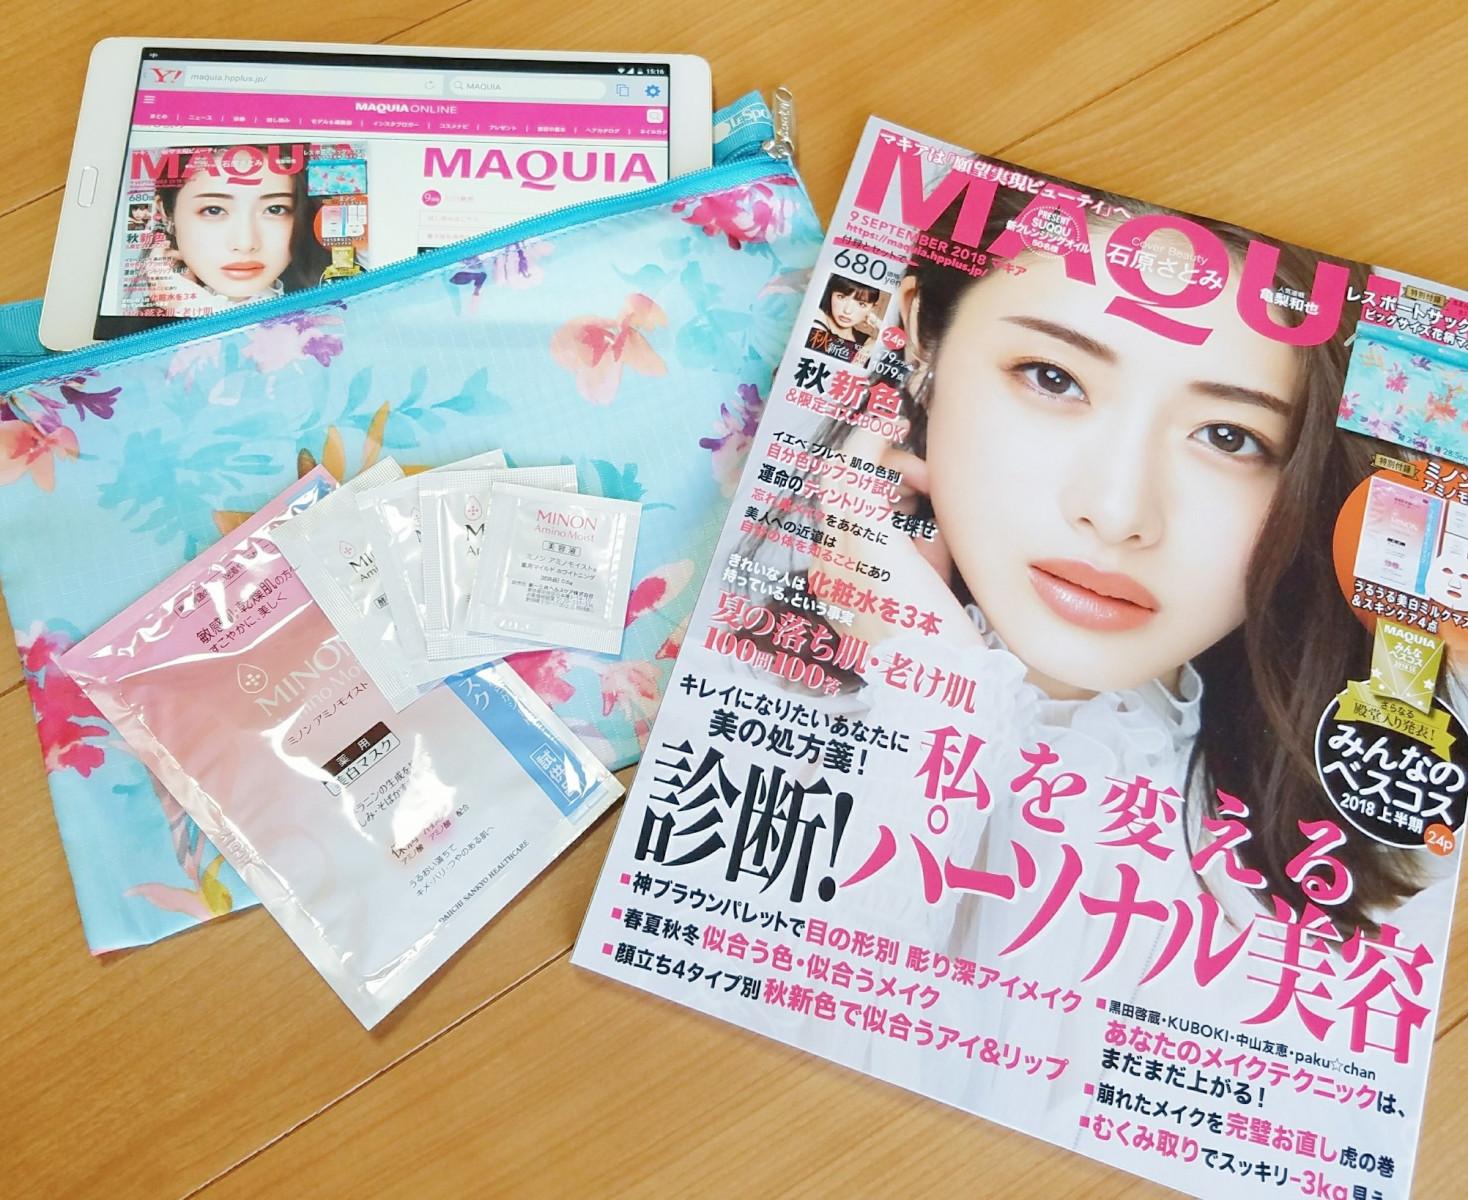 MAQUIA 9月号は豪華付録と秋色新色BOOK!